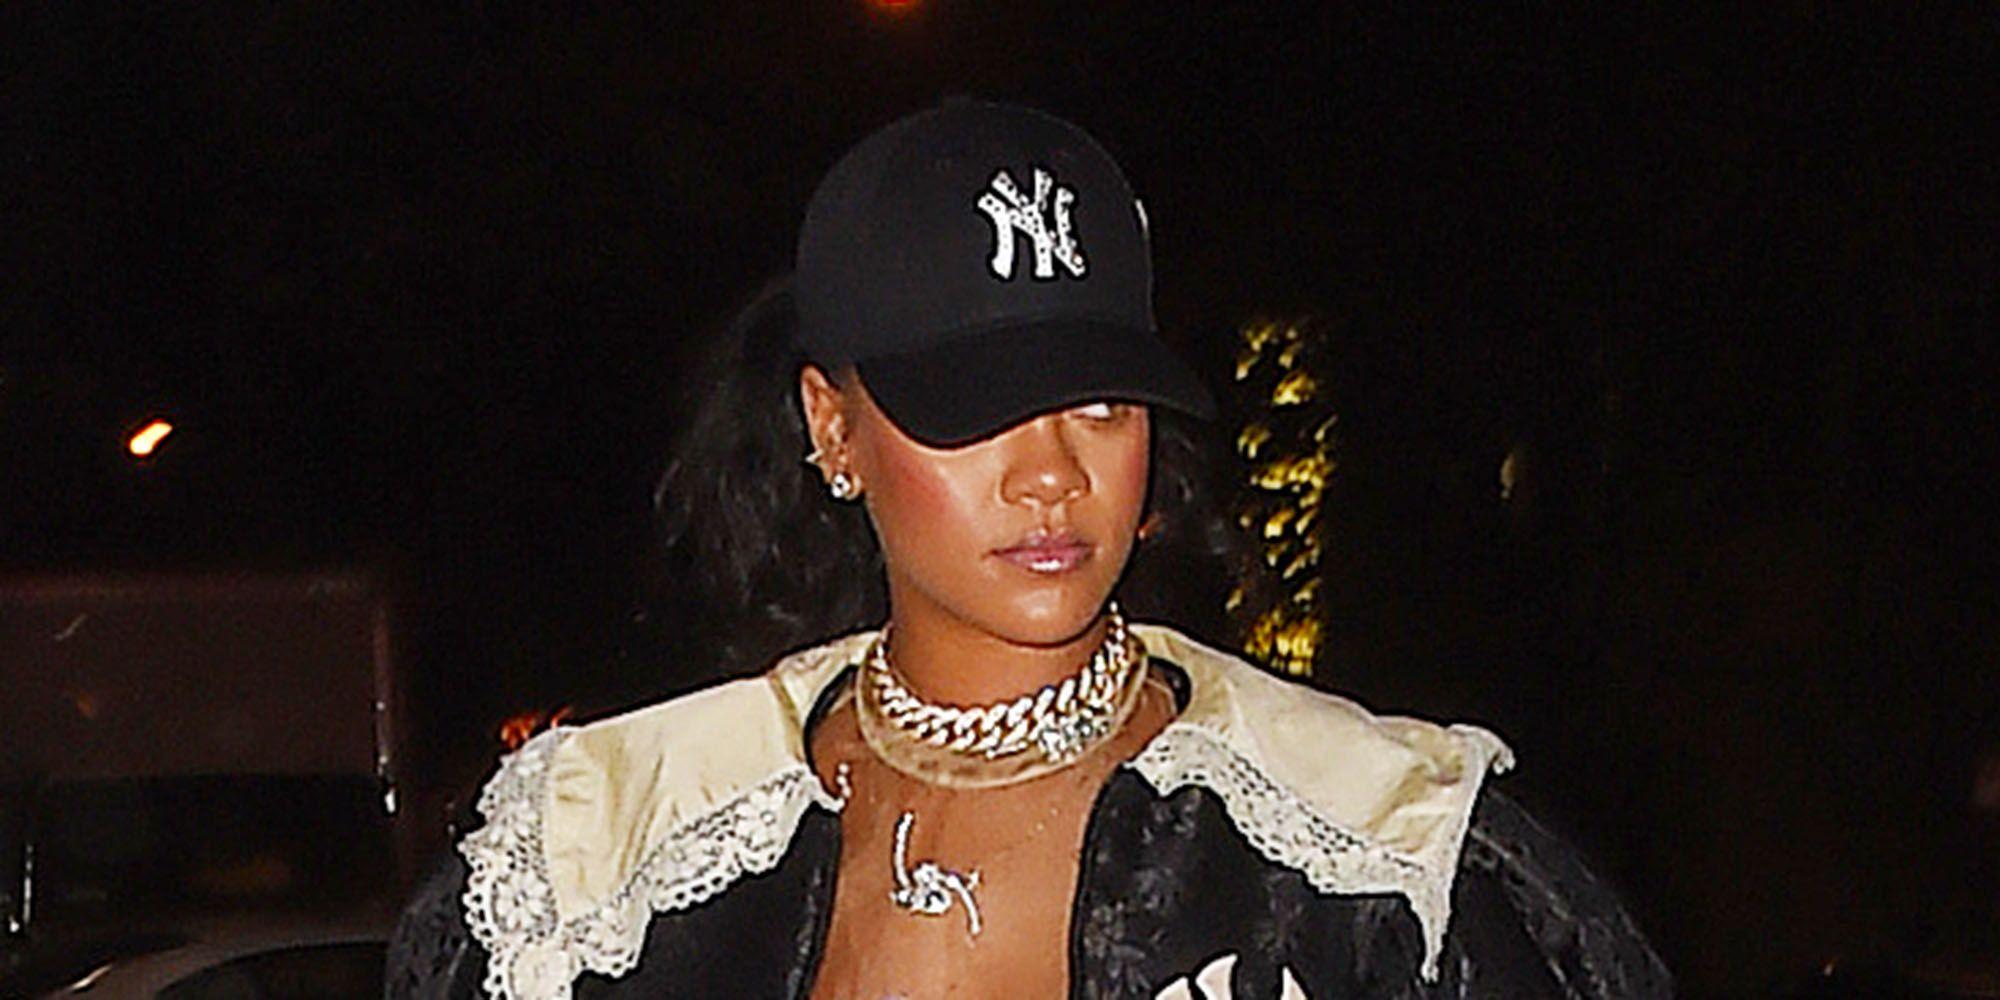 a5135afa0b9 Rihanna Style - Rihanna Best Fashion Photos